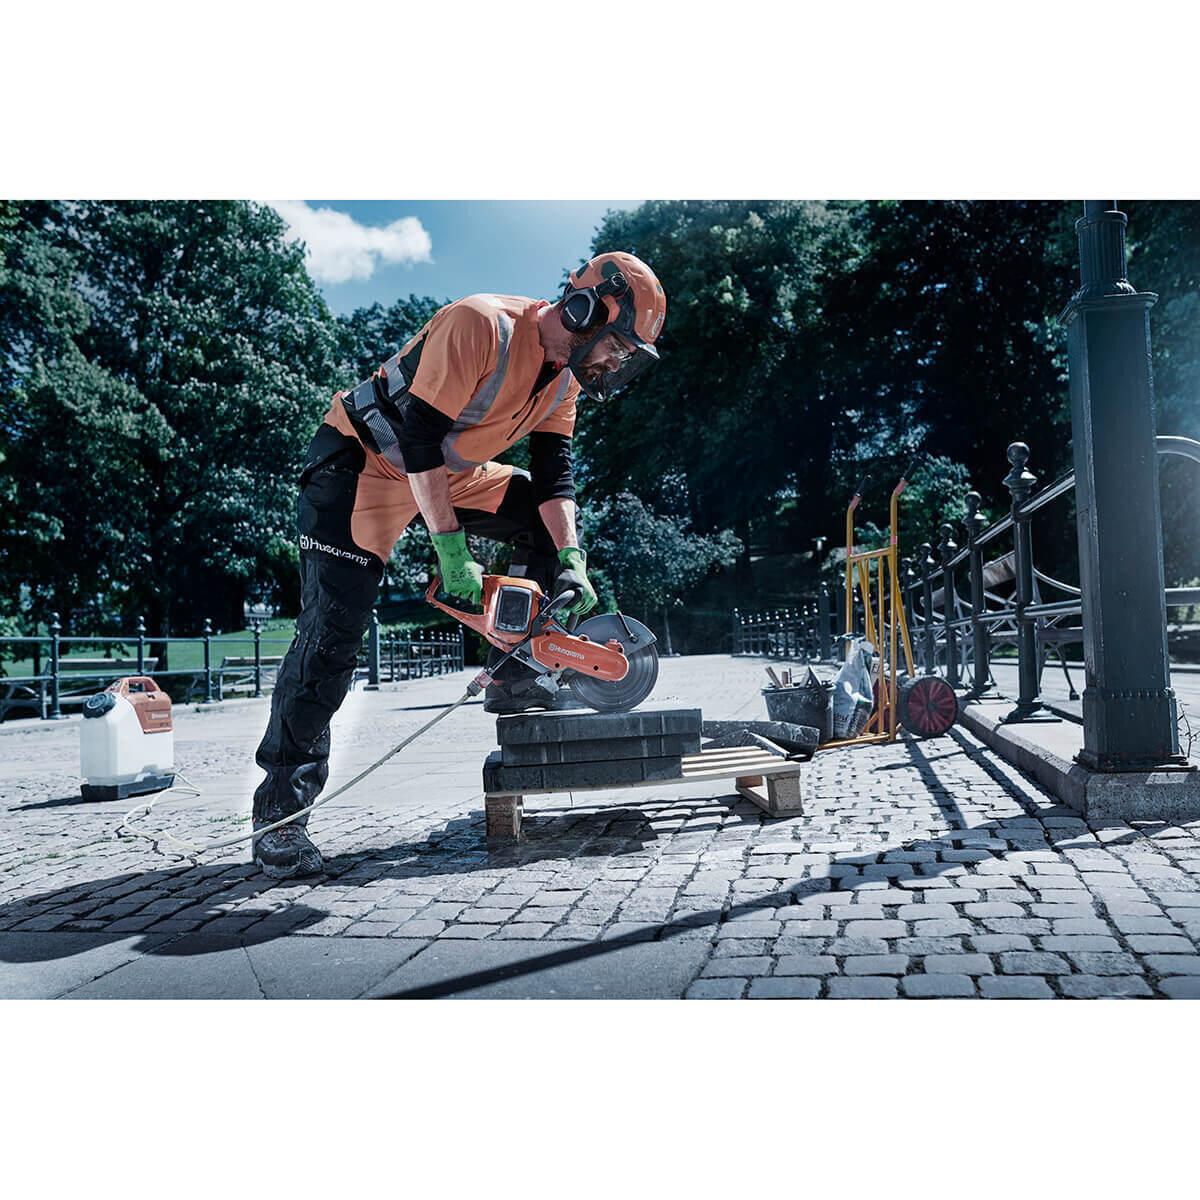 Cutting Landscape Pavers with Husqvarna K535i Power Cutter